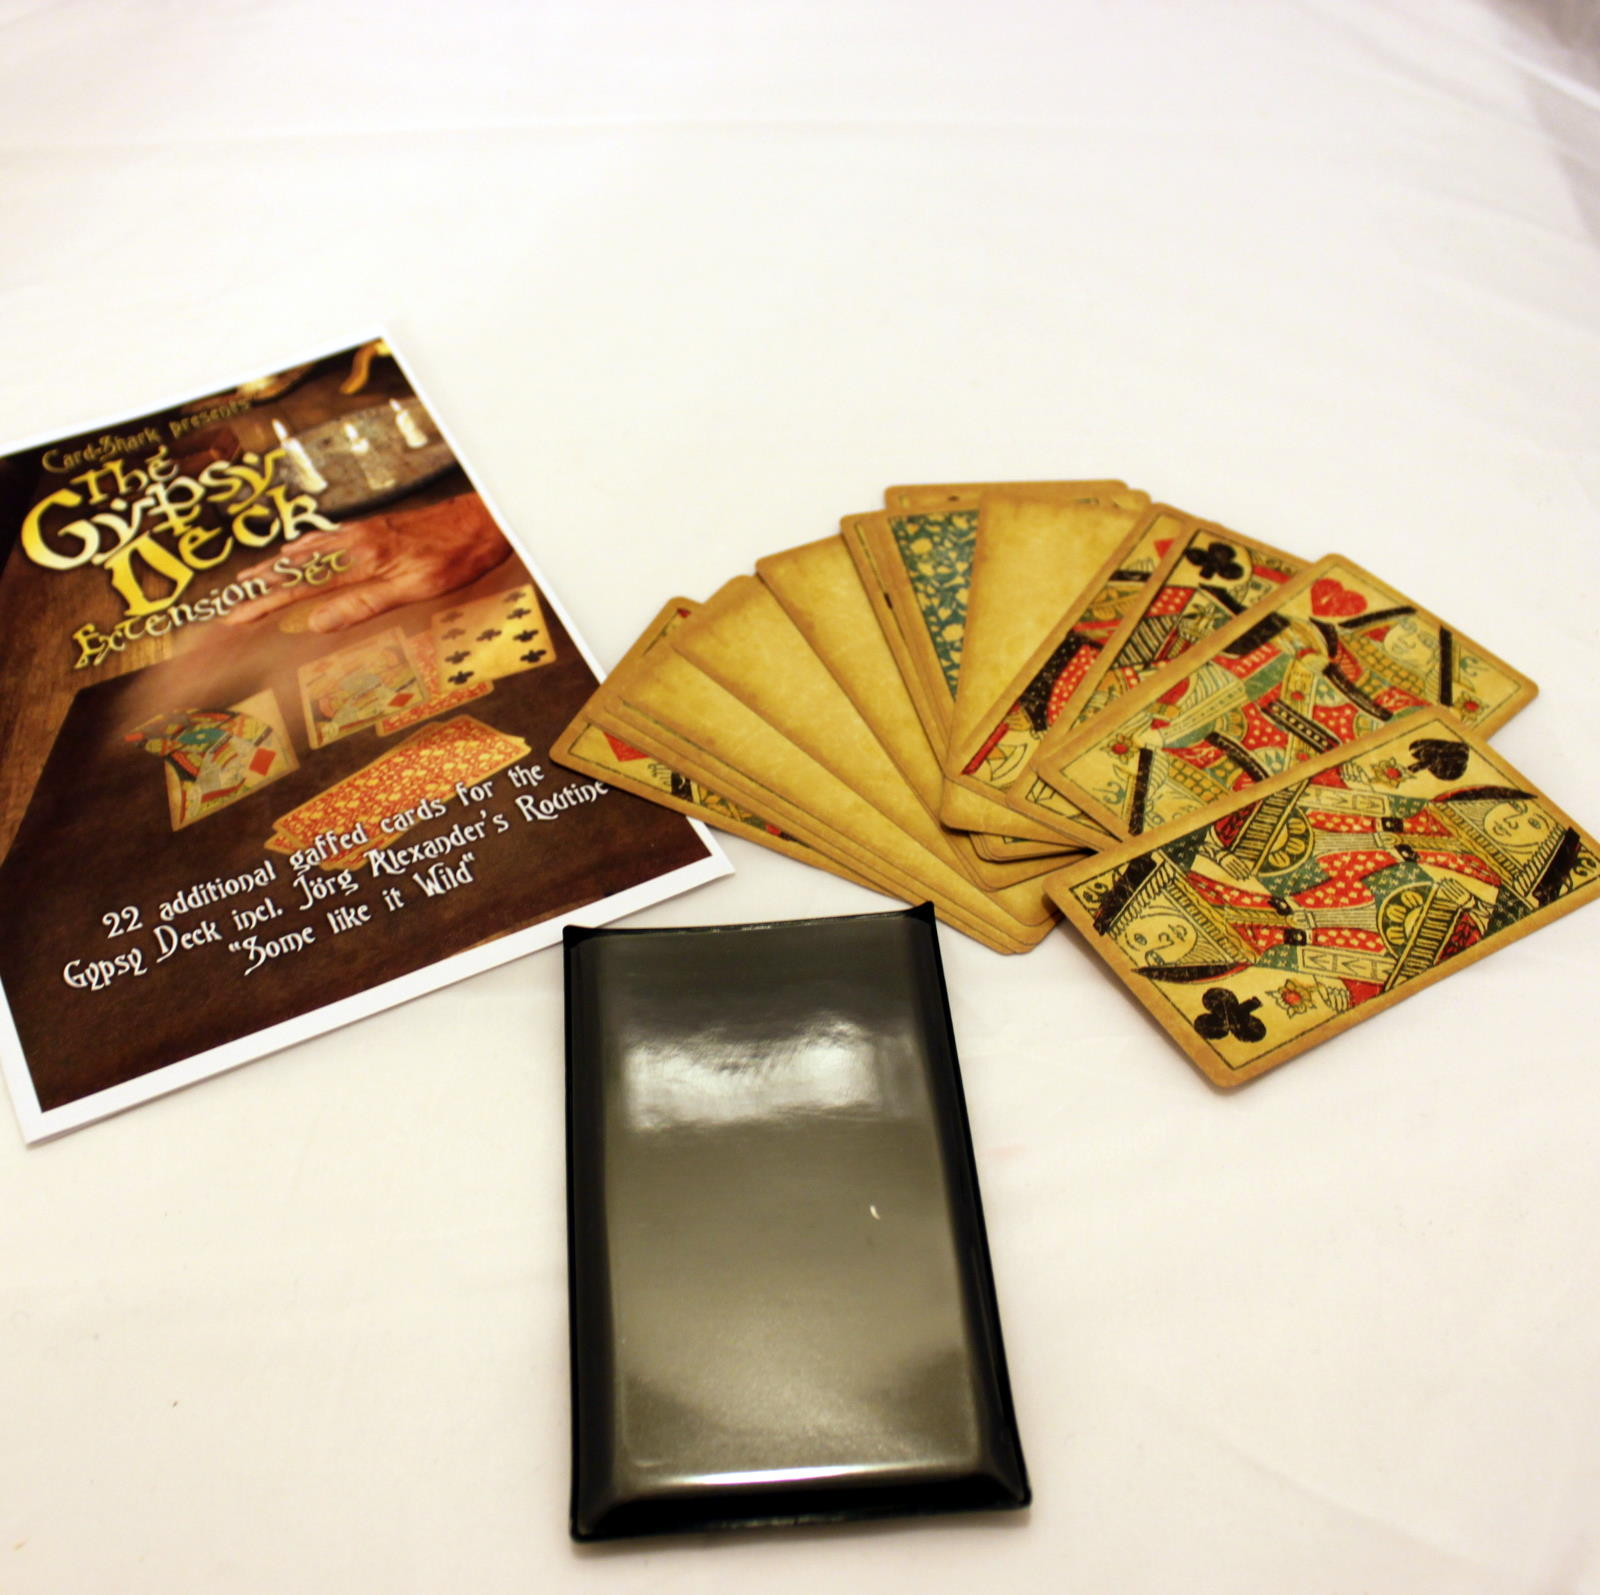 Card-Shark - Gypsy Extension Set by Card-Shark